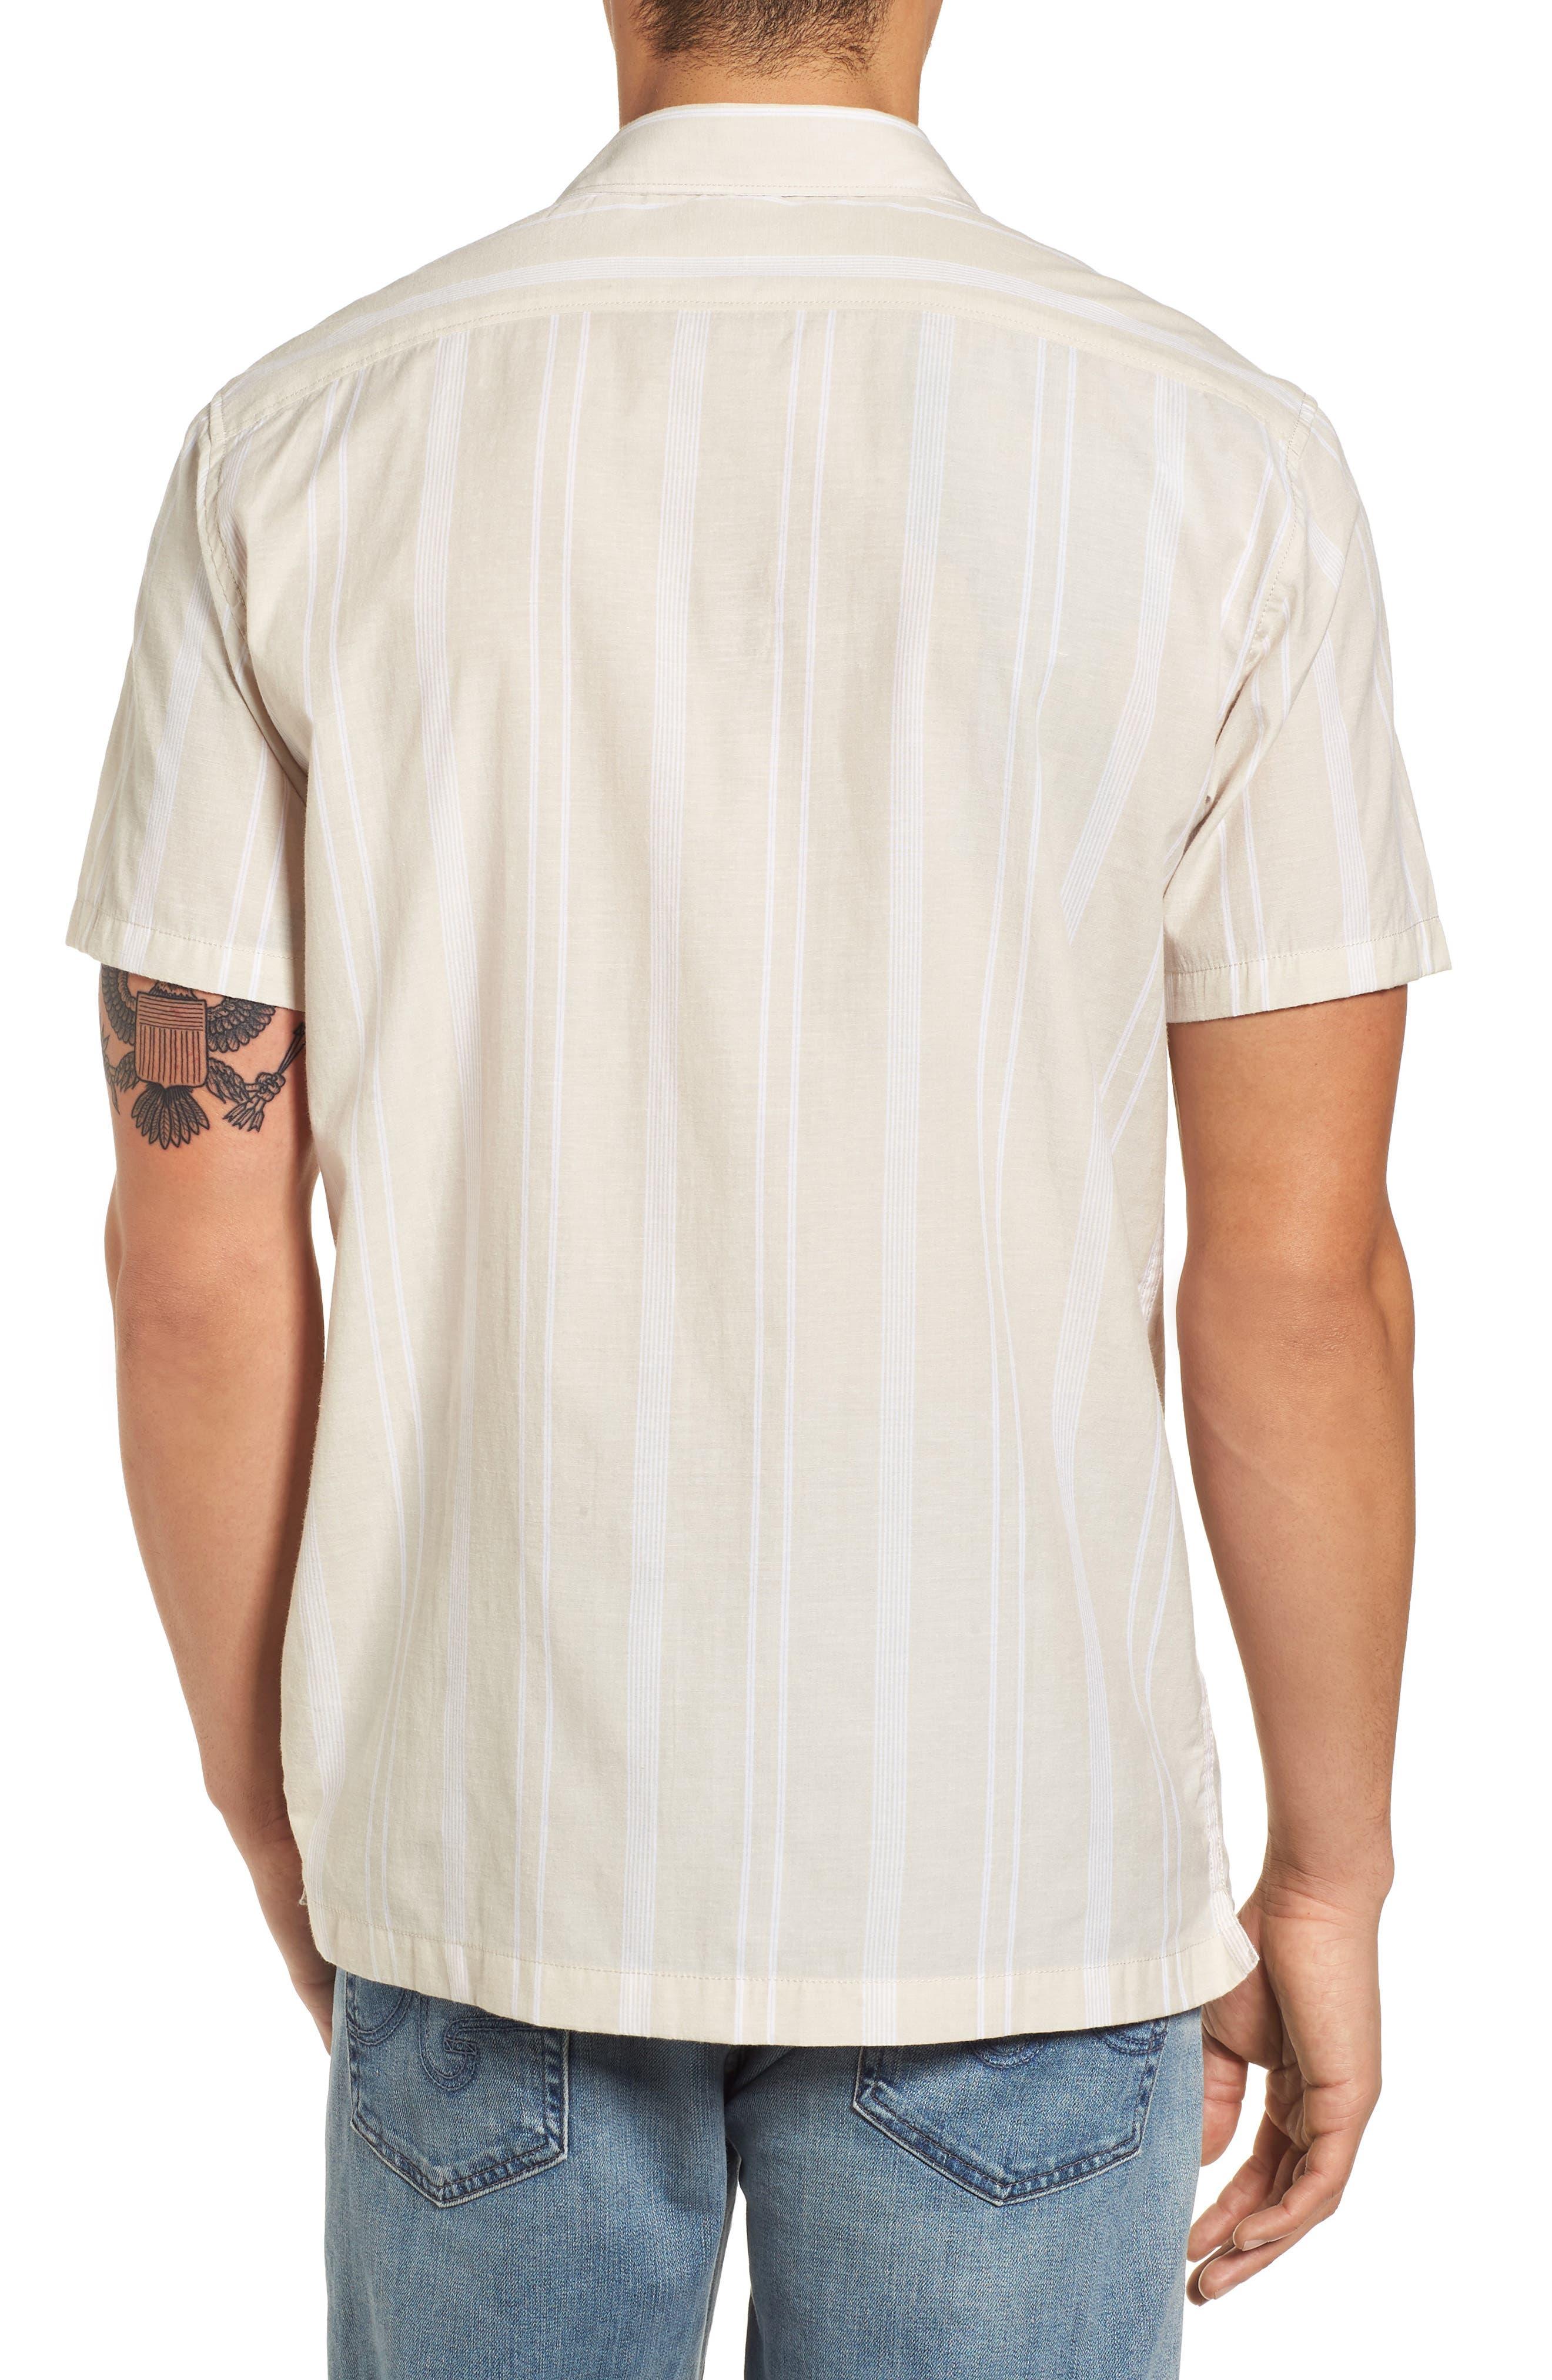 Alternate Image 3  - Billabong Donny Short Sleeve Shirt